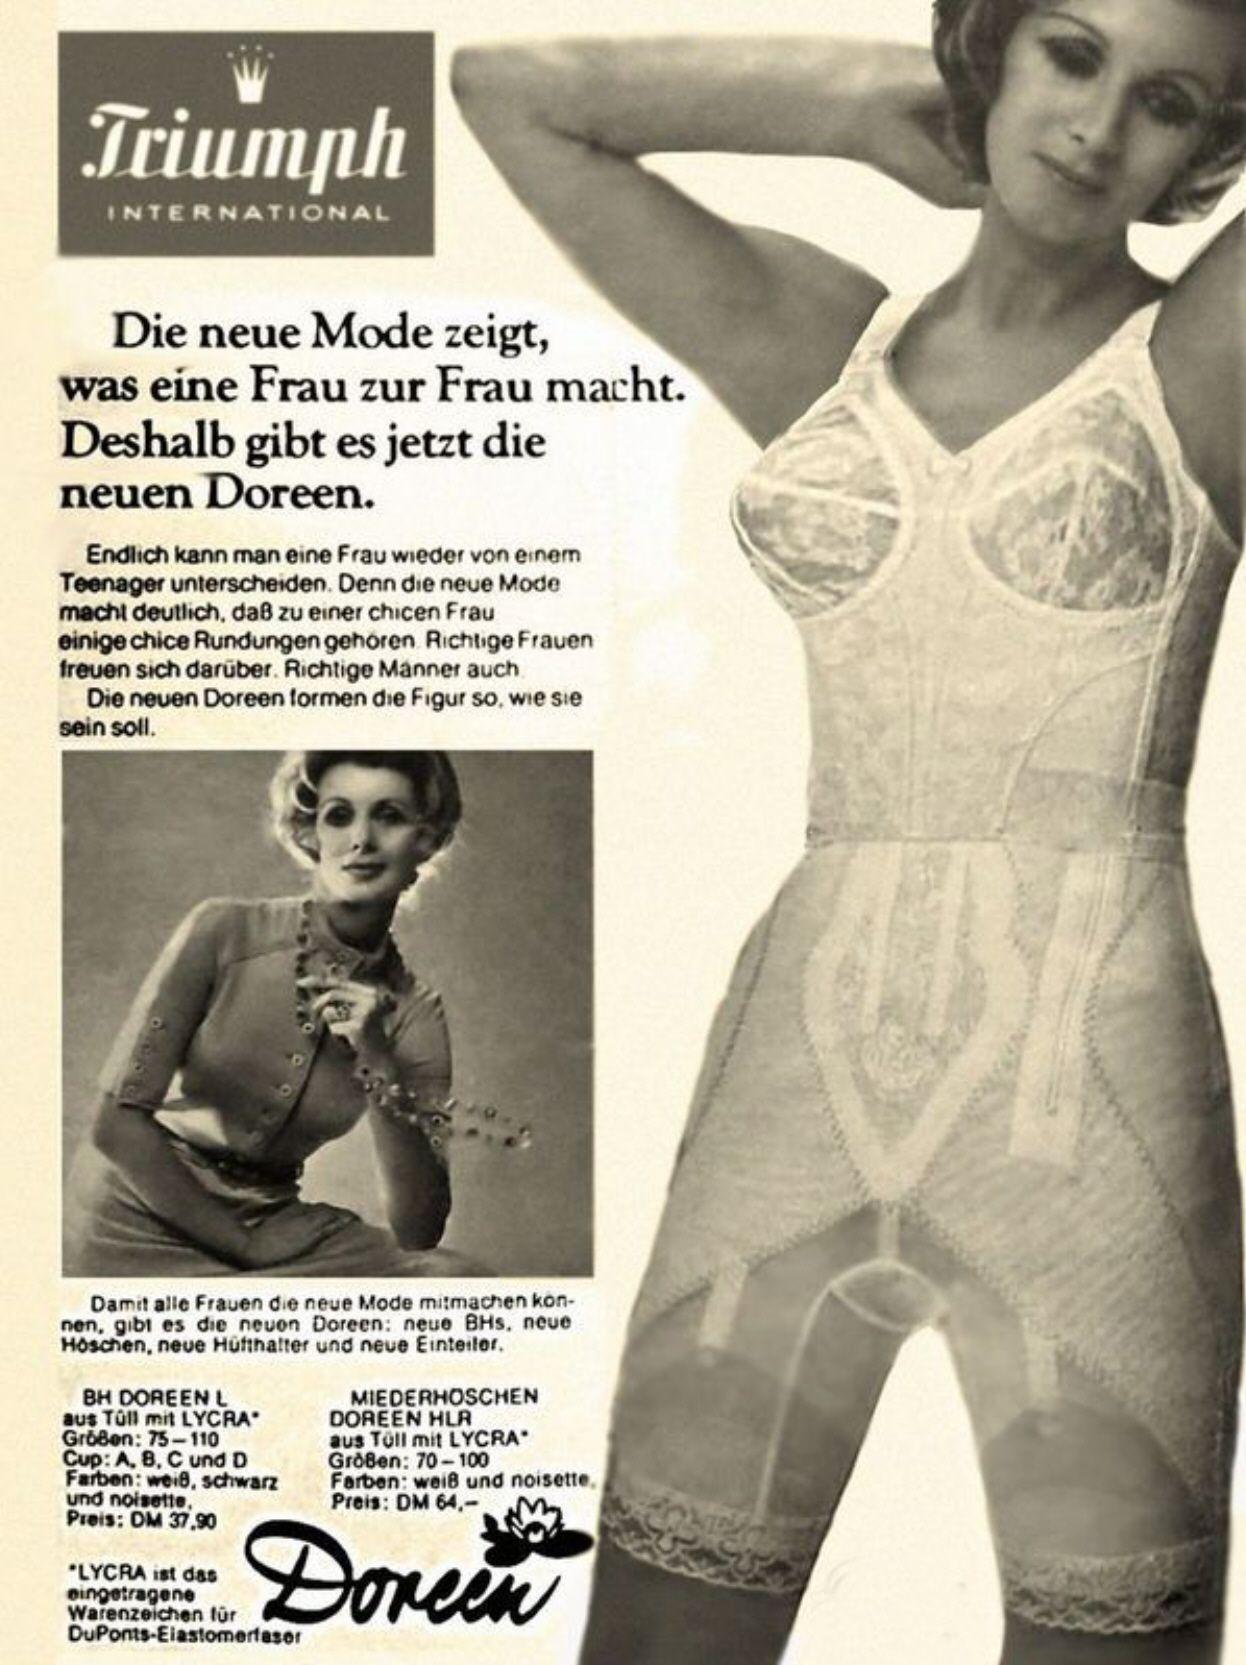 Triumph Doreen Long Leg Panty Girdle With Zipper And Longline